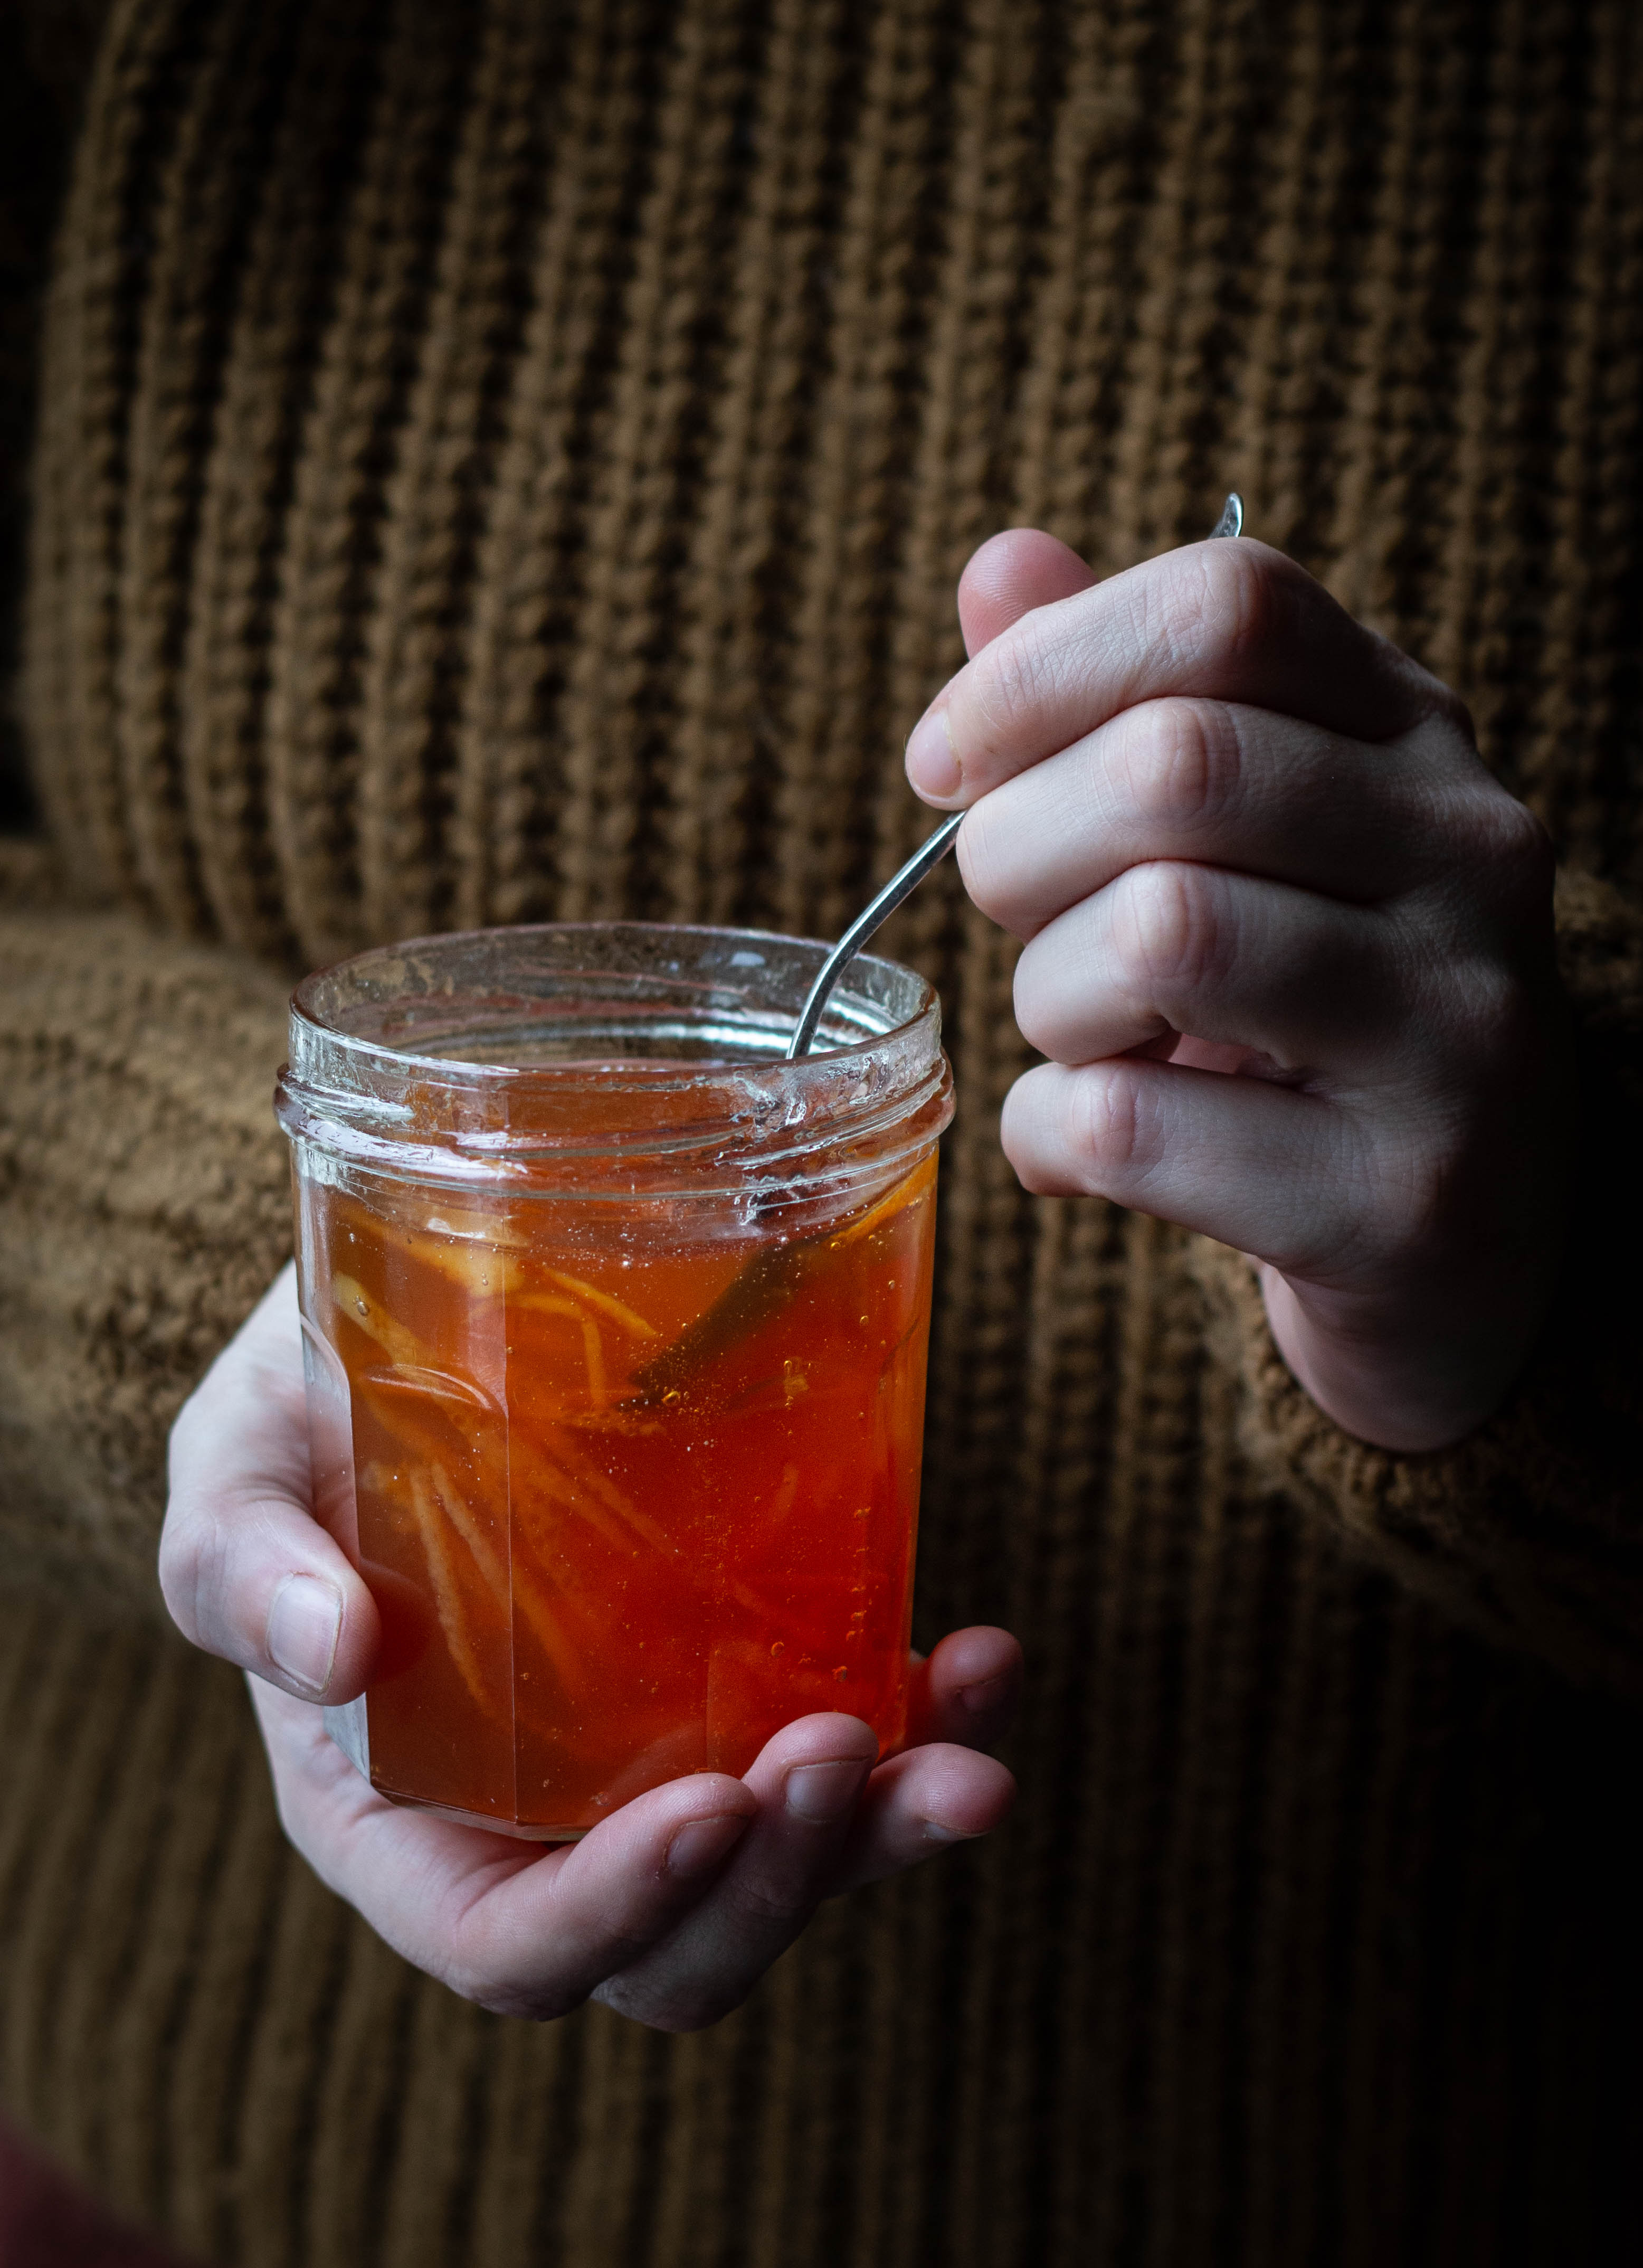 blood orange cardamom marmalade